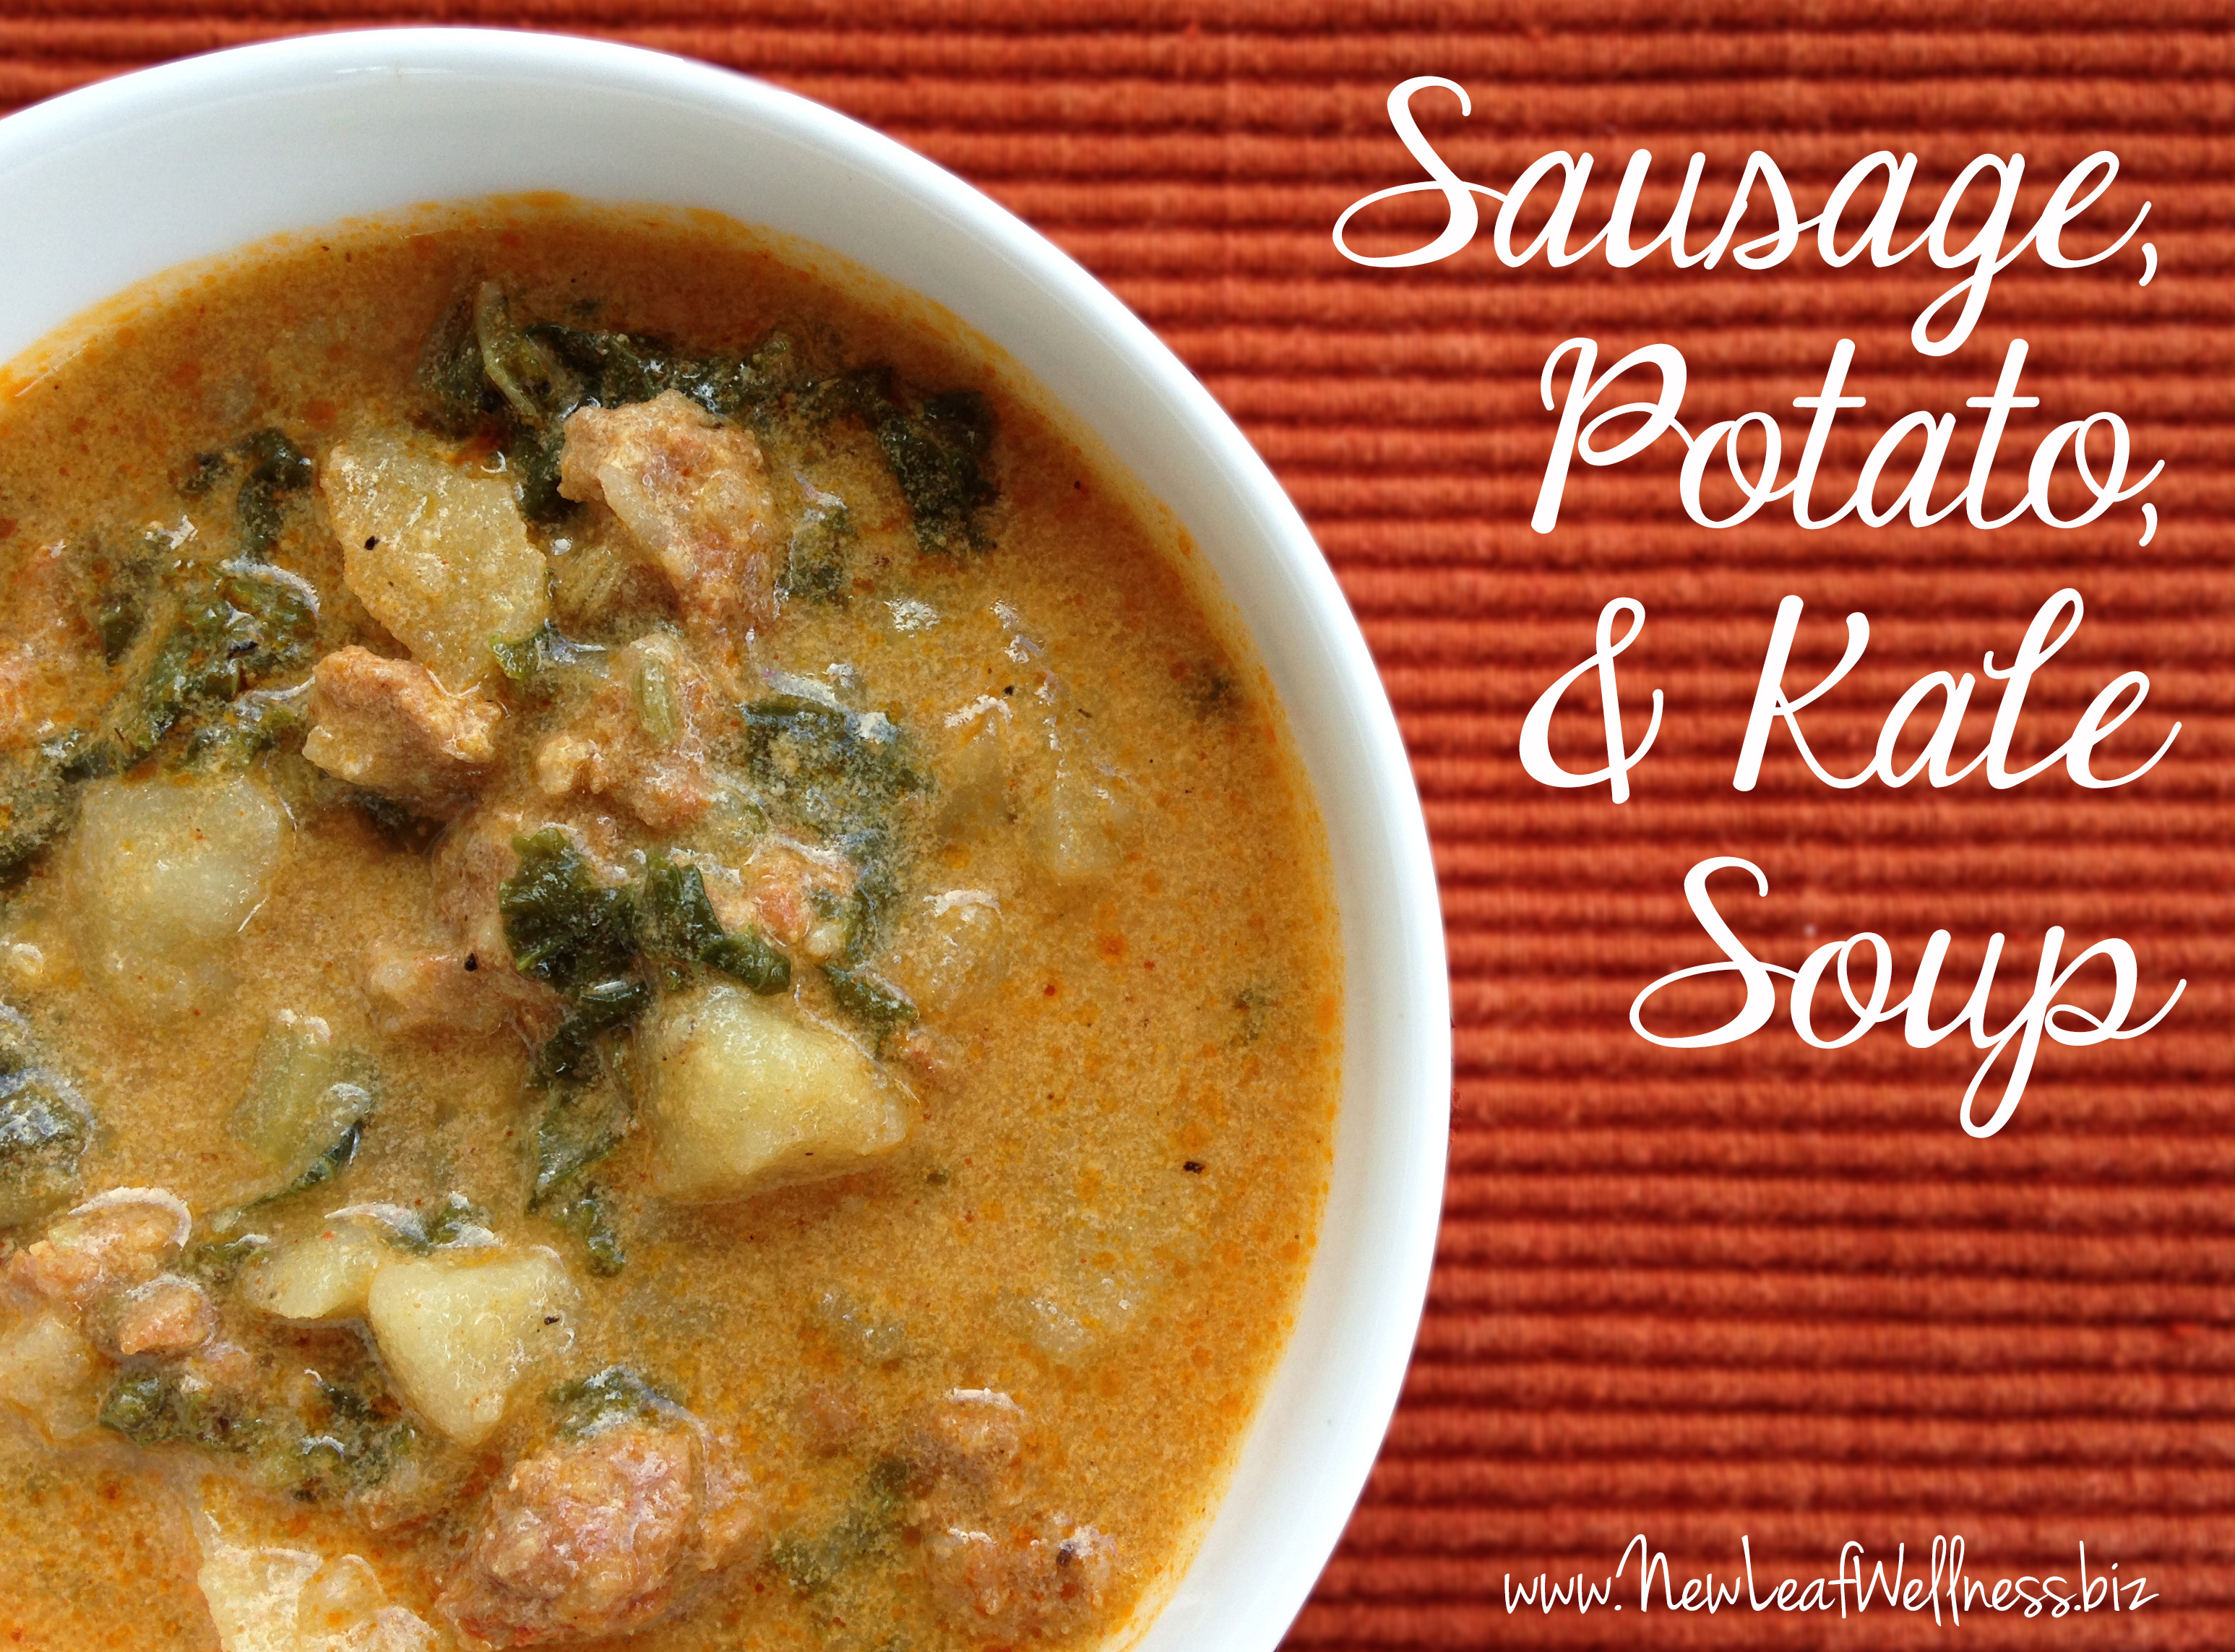 Sausage Potato Soup  Sausage Potato and Kale Soup Recipe – New Leaf Wellness